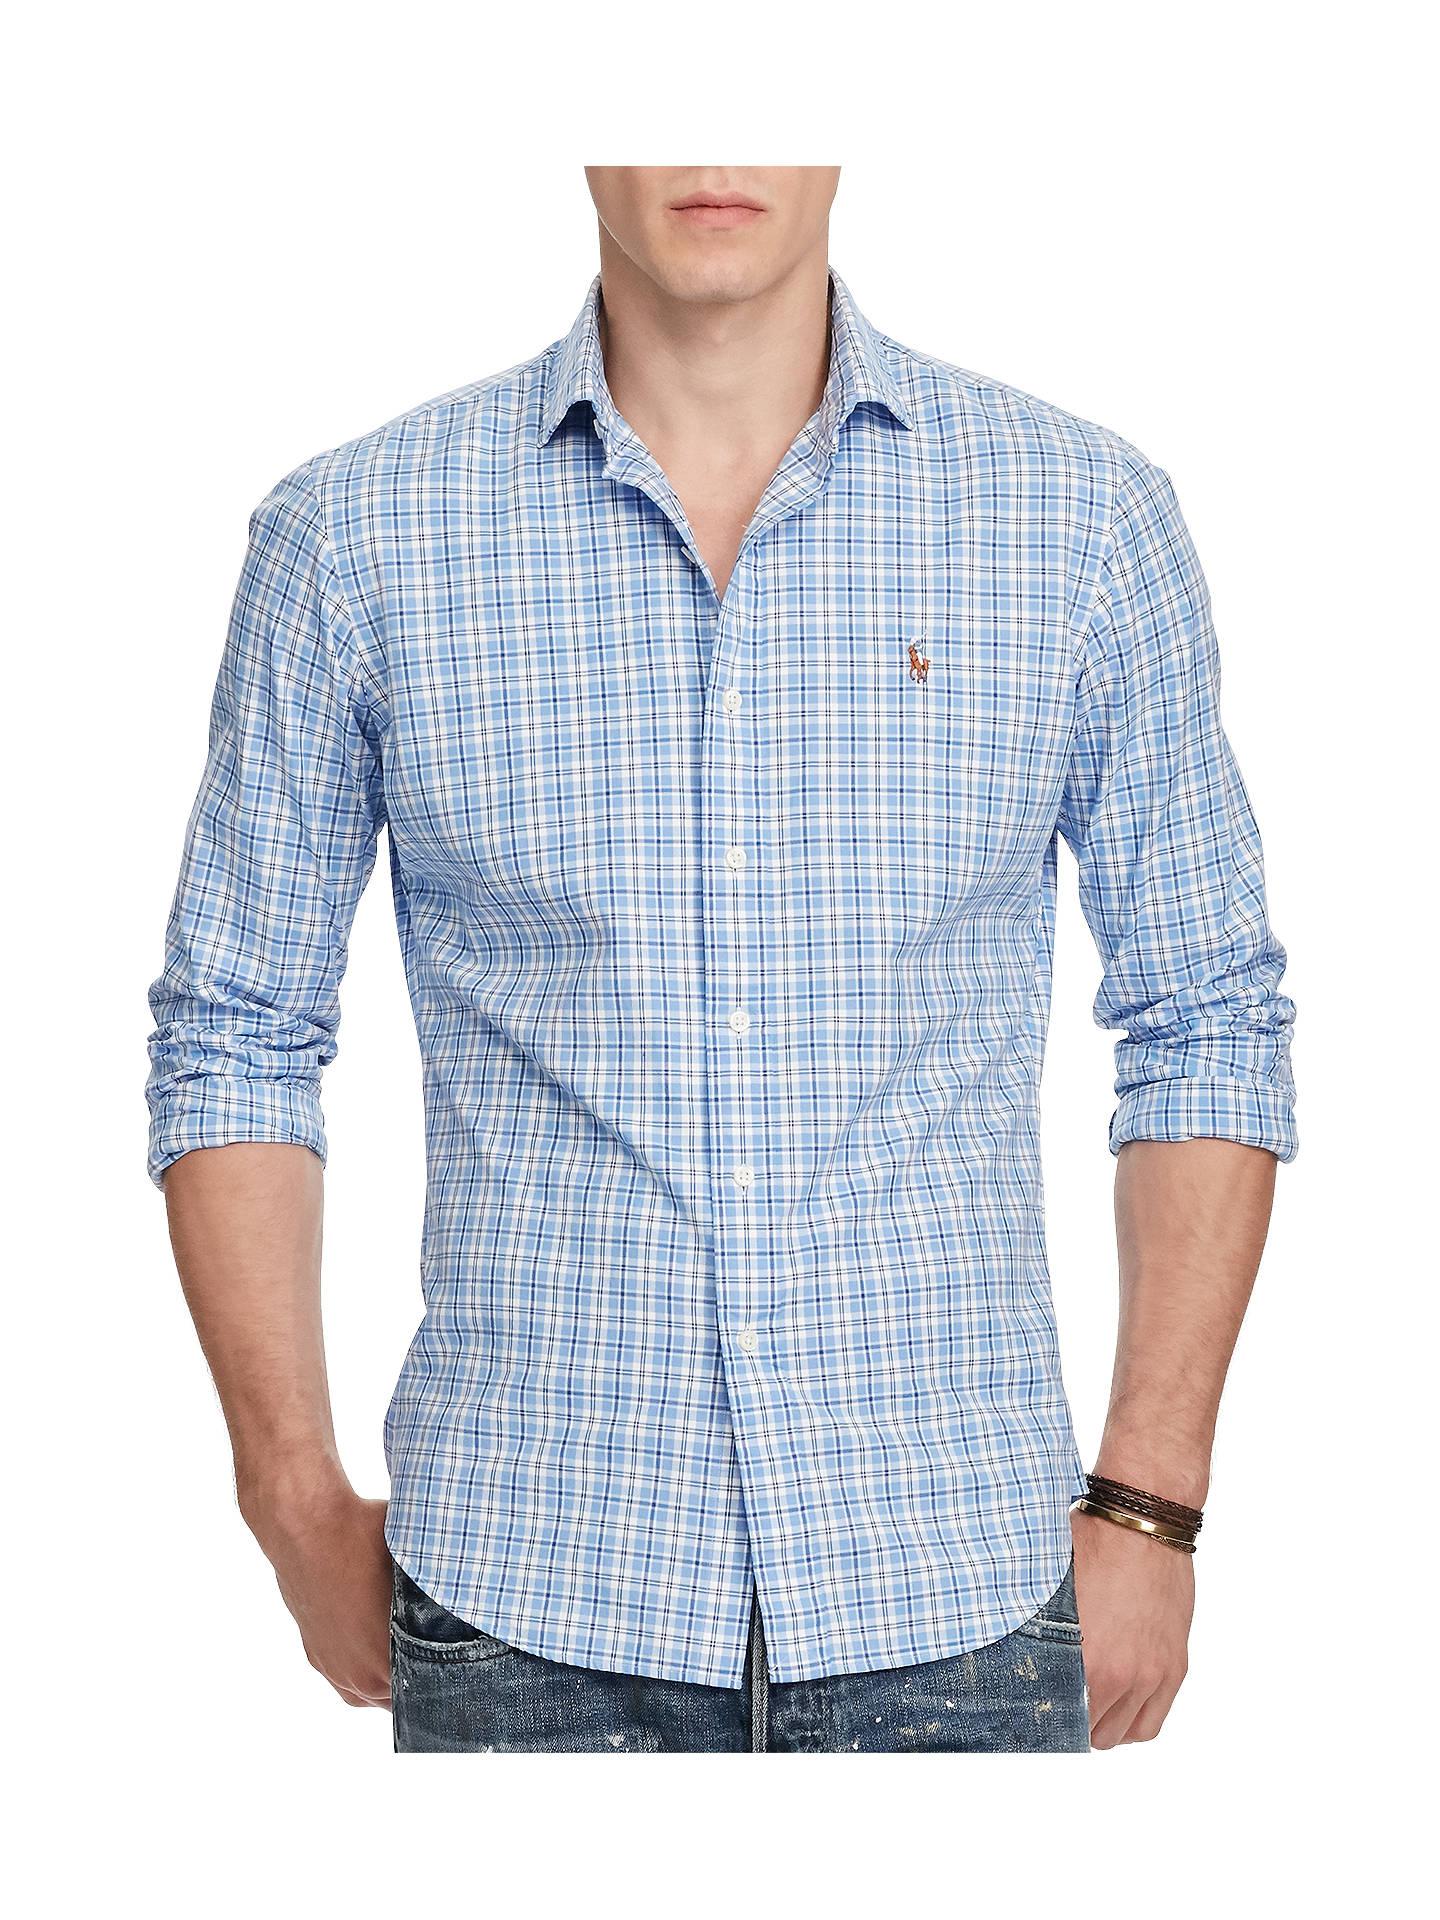 BuyPolo Ralph Lauren Standard Fit Plaid Cotton Oxford Shirt bf7e8a93d72f